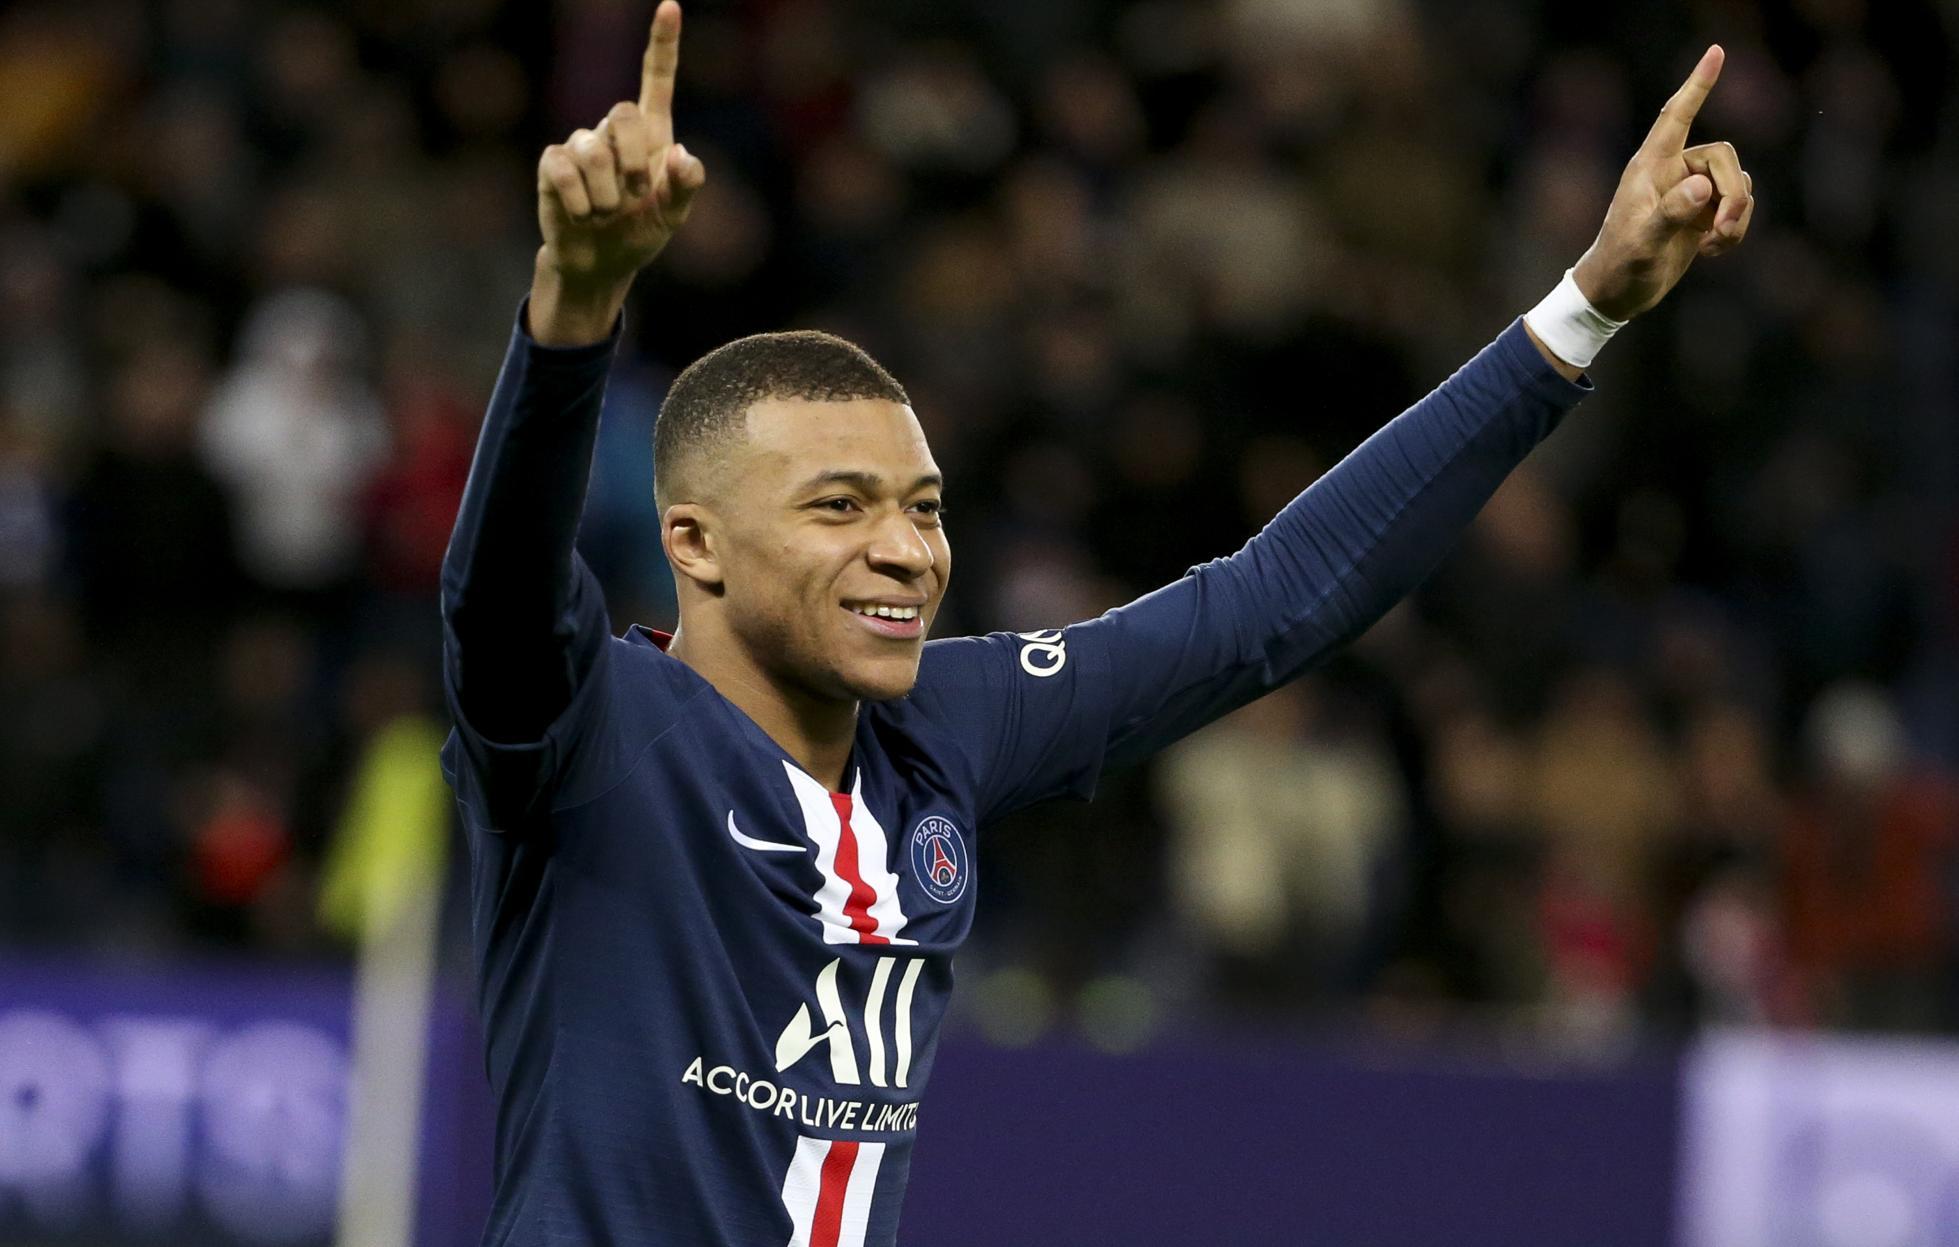 Kylian Mbappe celebrates scoring a goal.